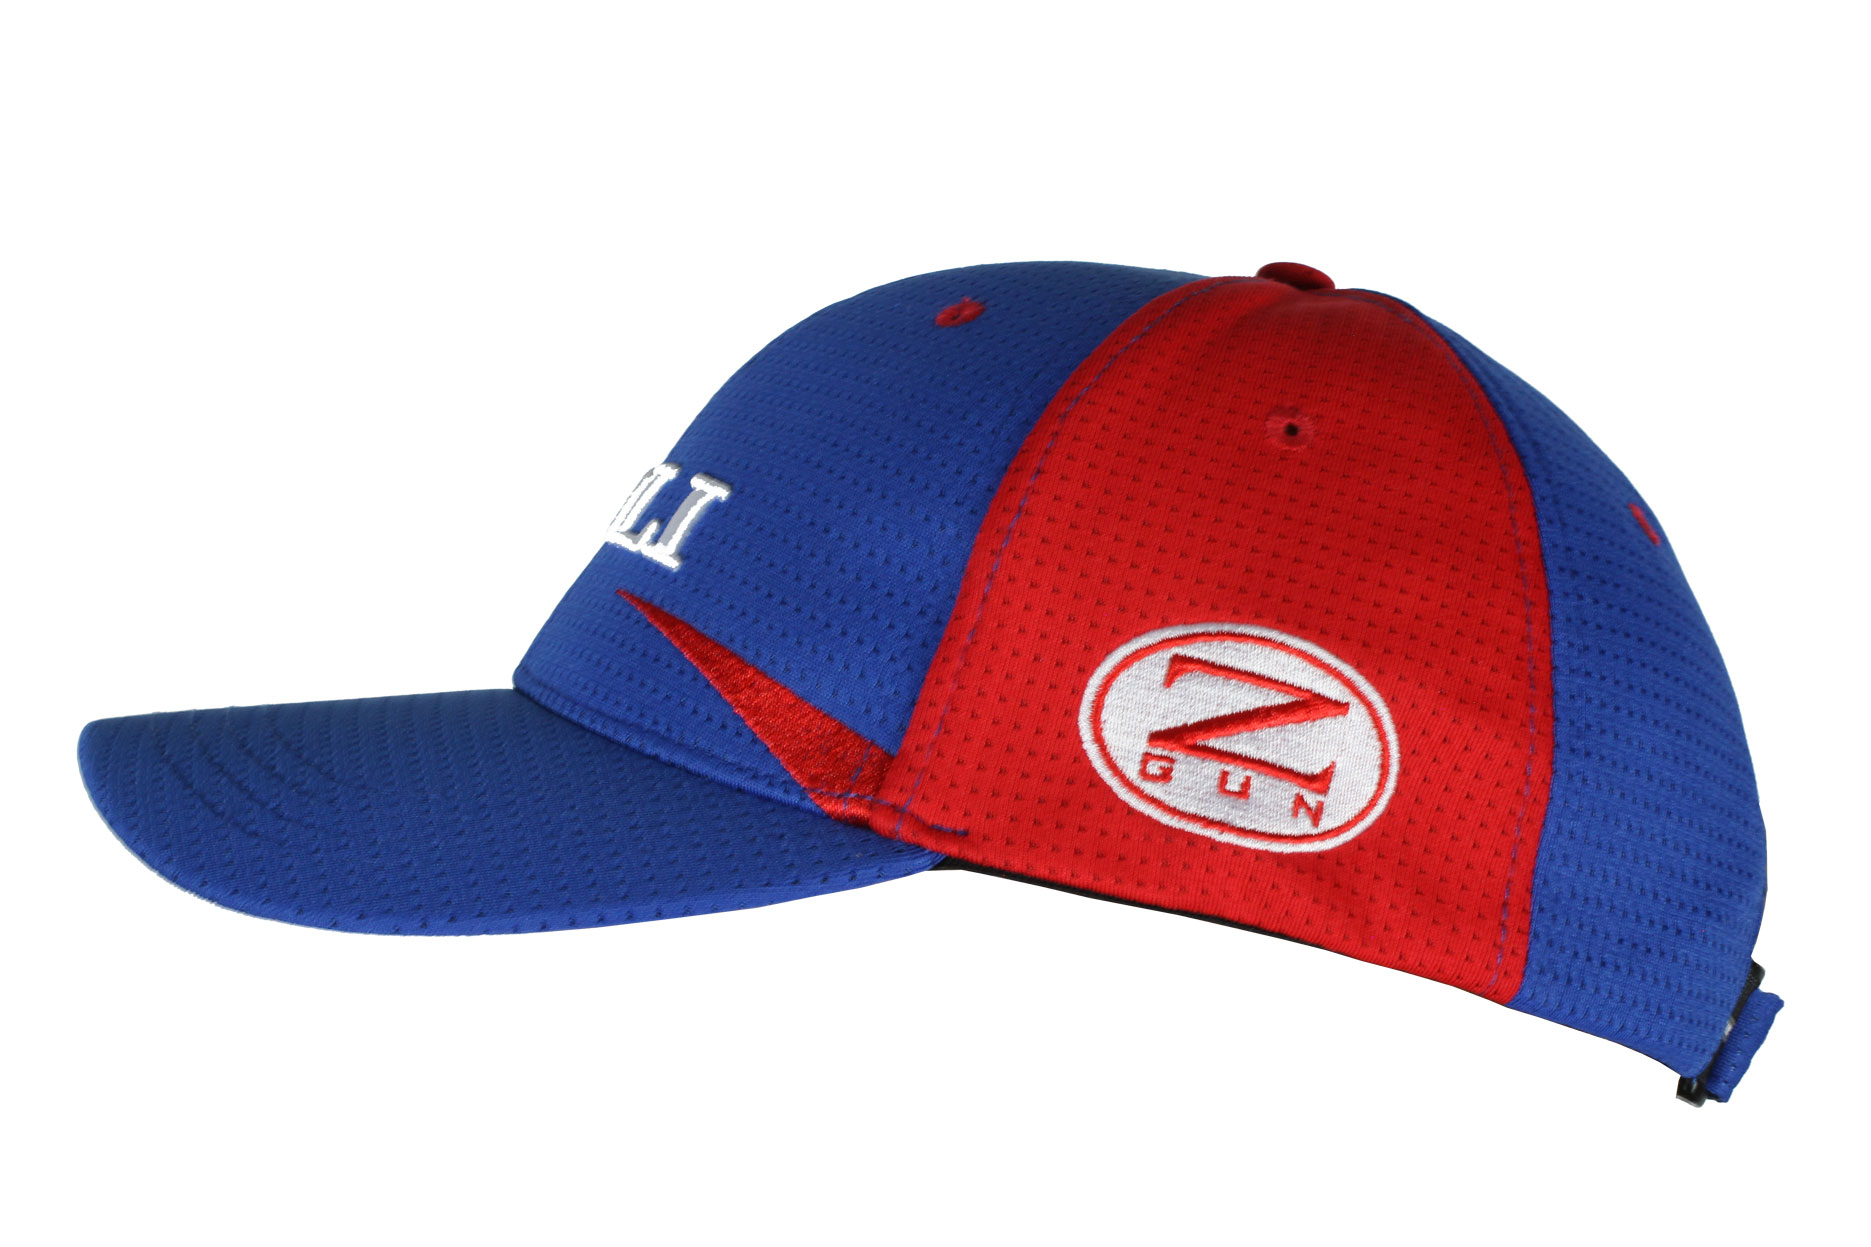 Zoli Dart Embroidered Hat Side